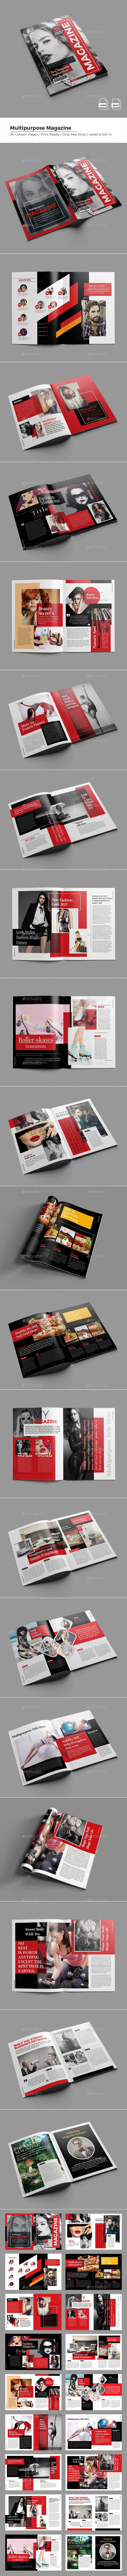 36 Pages Multipurpose Magazine - Magazines Print Templates